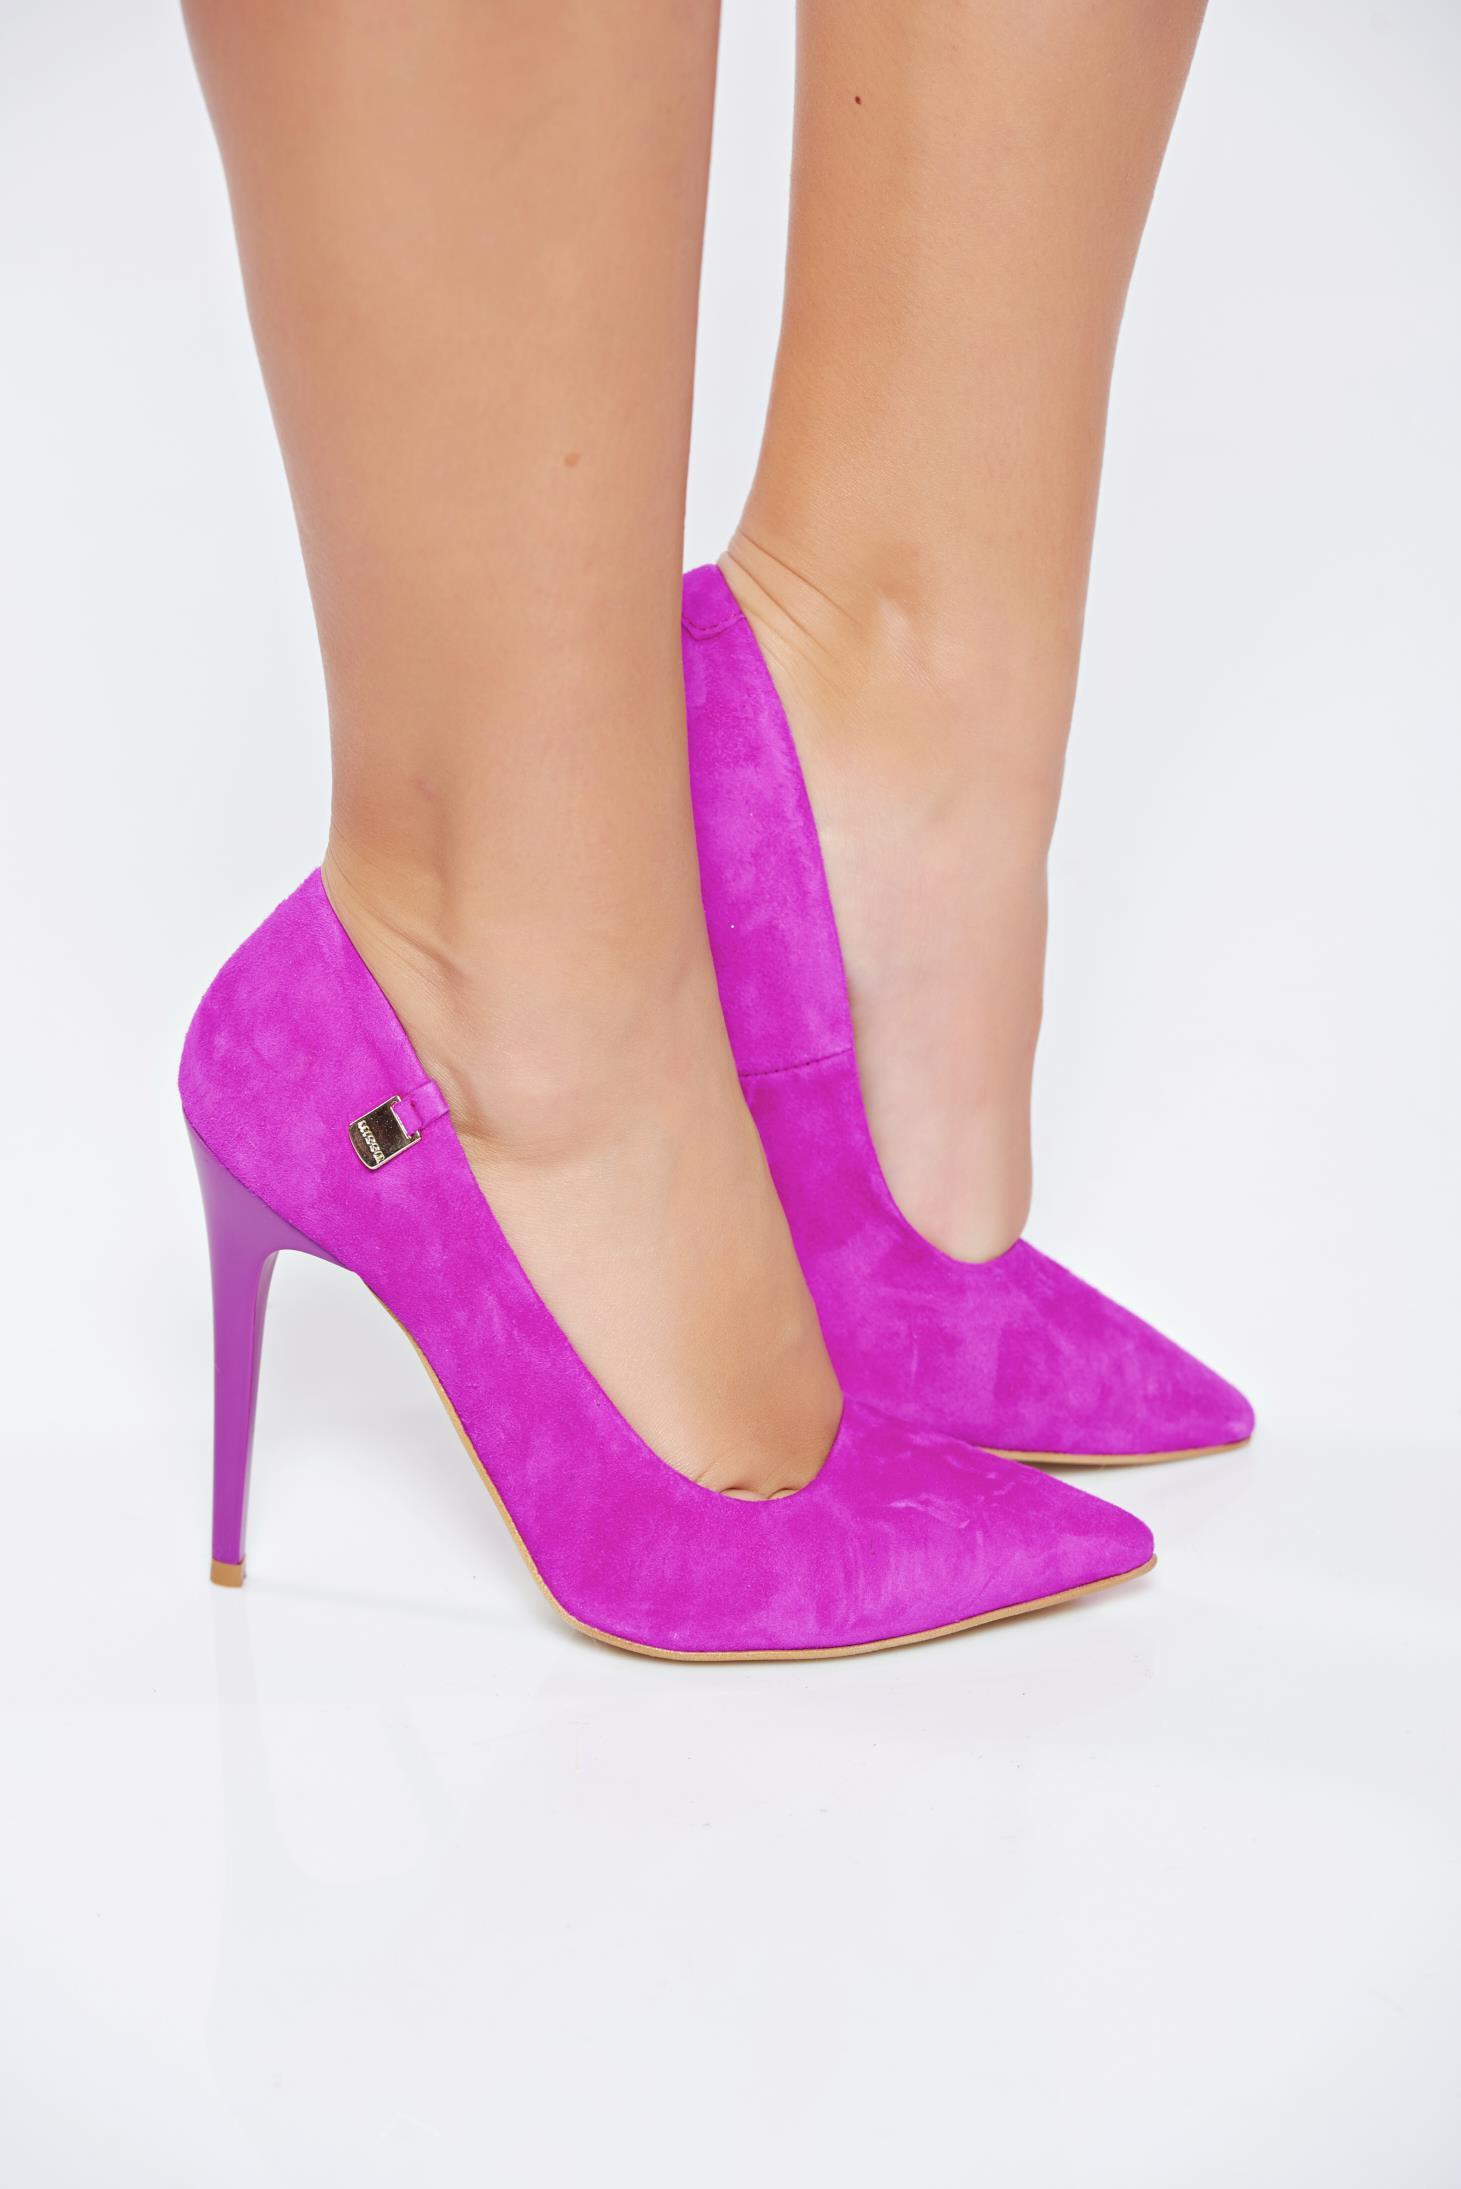 Pantofi stiletto MissQ fuchsia din piele naturala intoarsa cu toc inalt